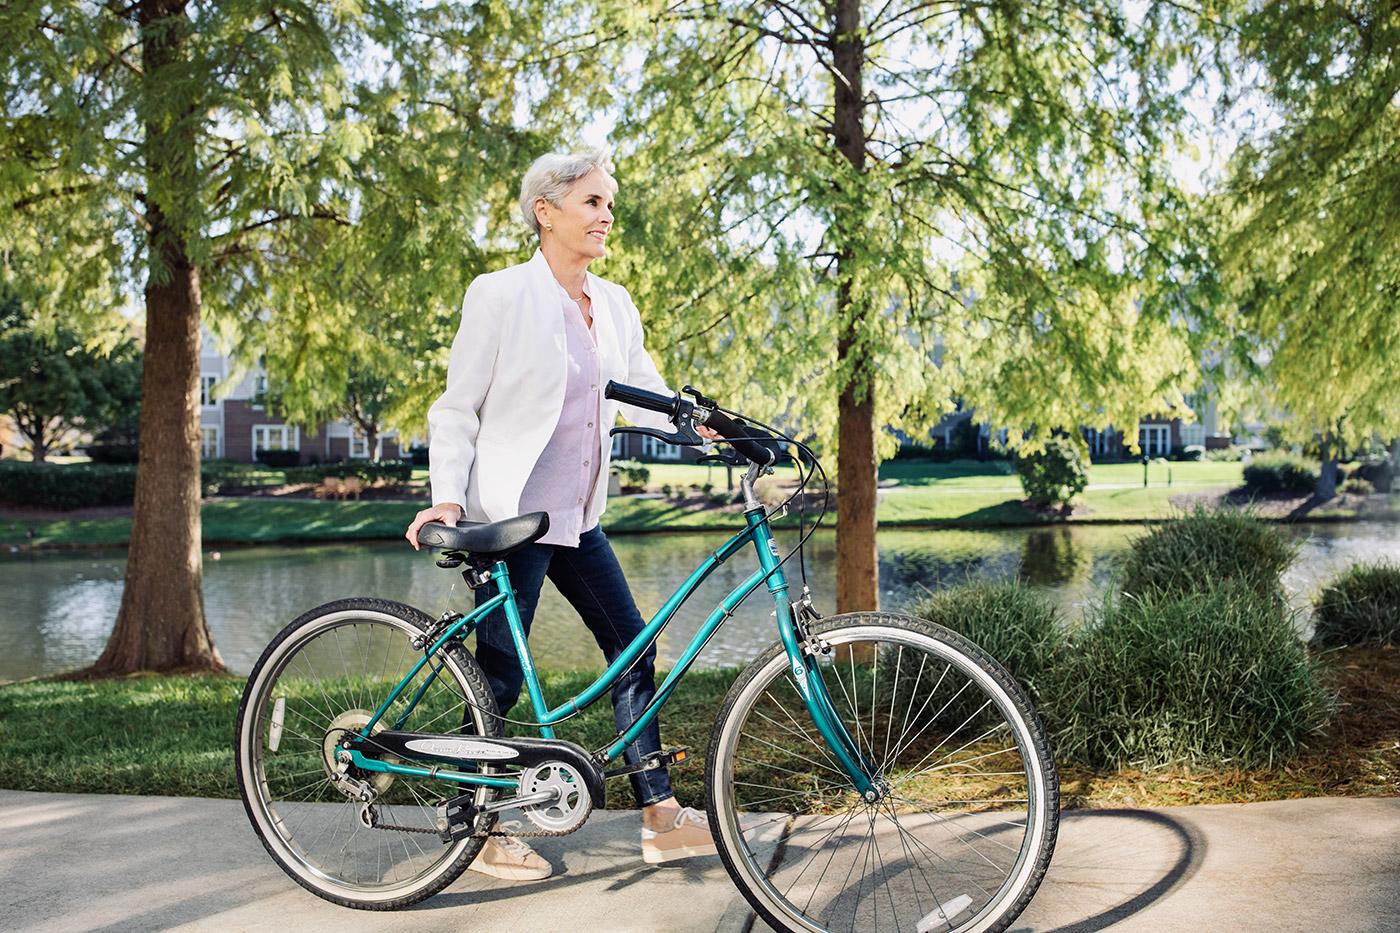 women on a sidewalk with her bike